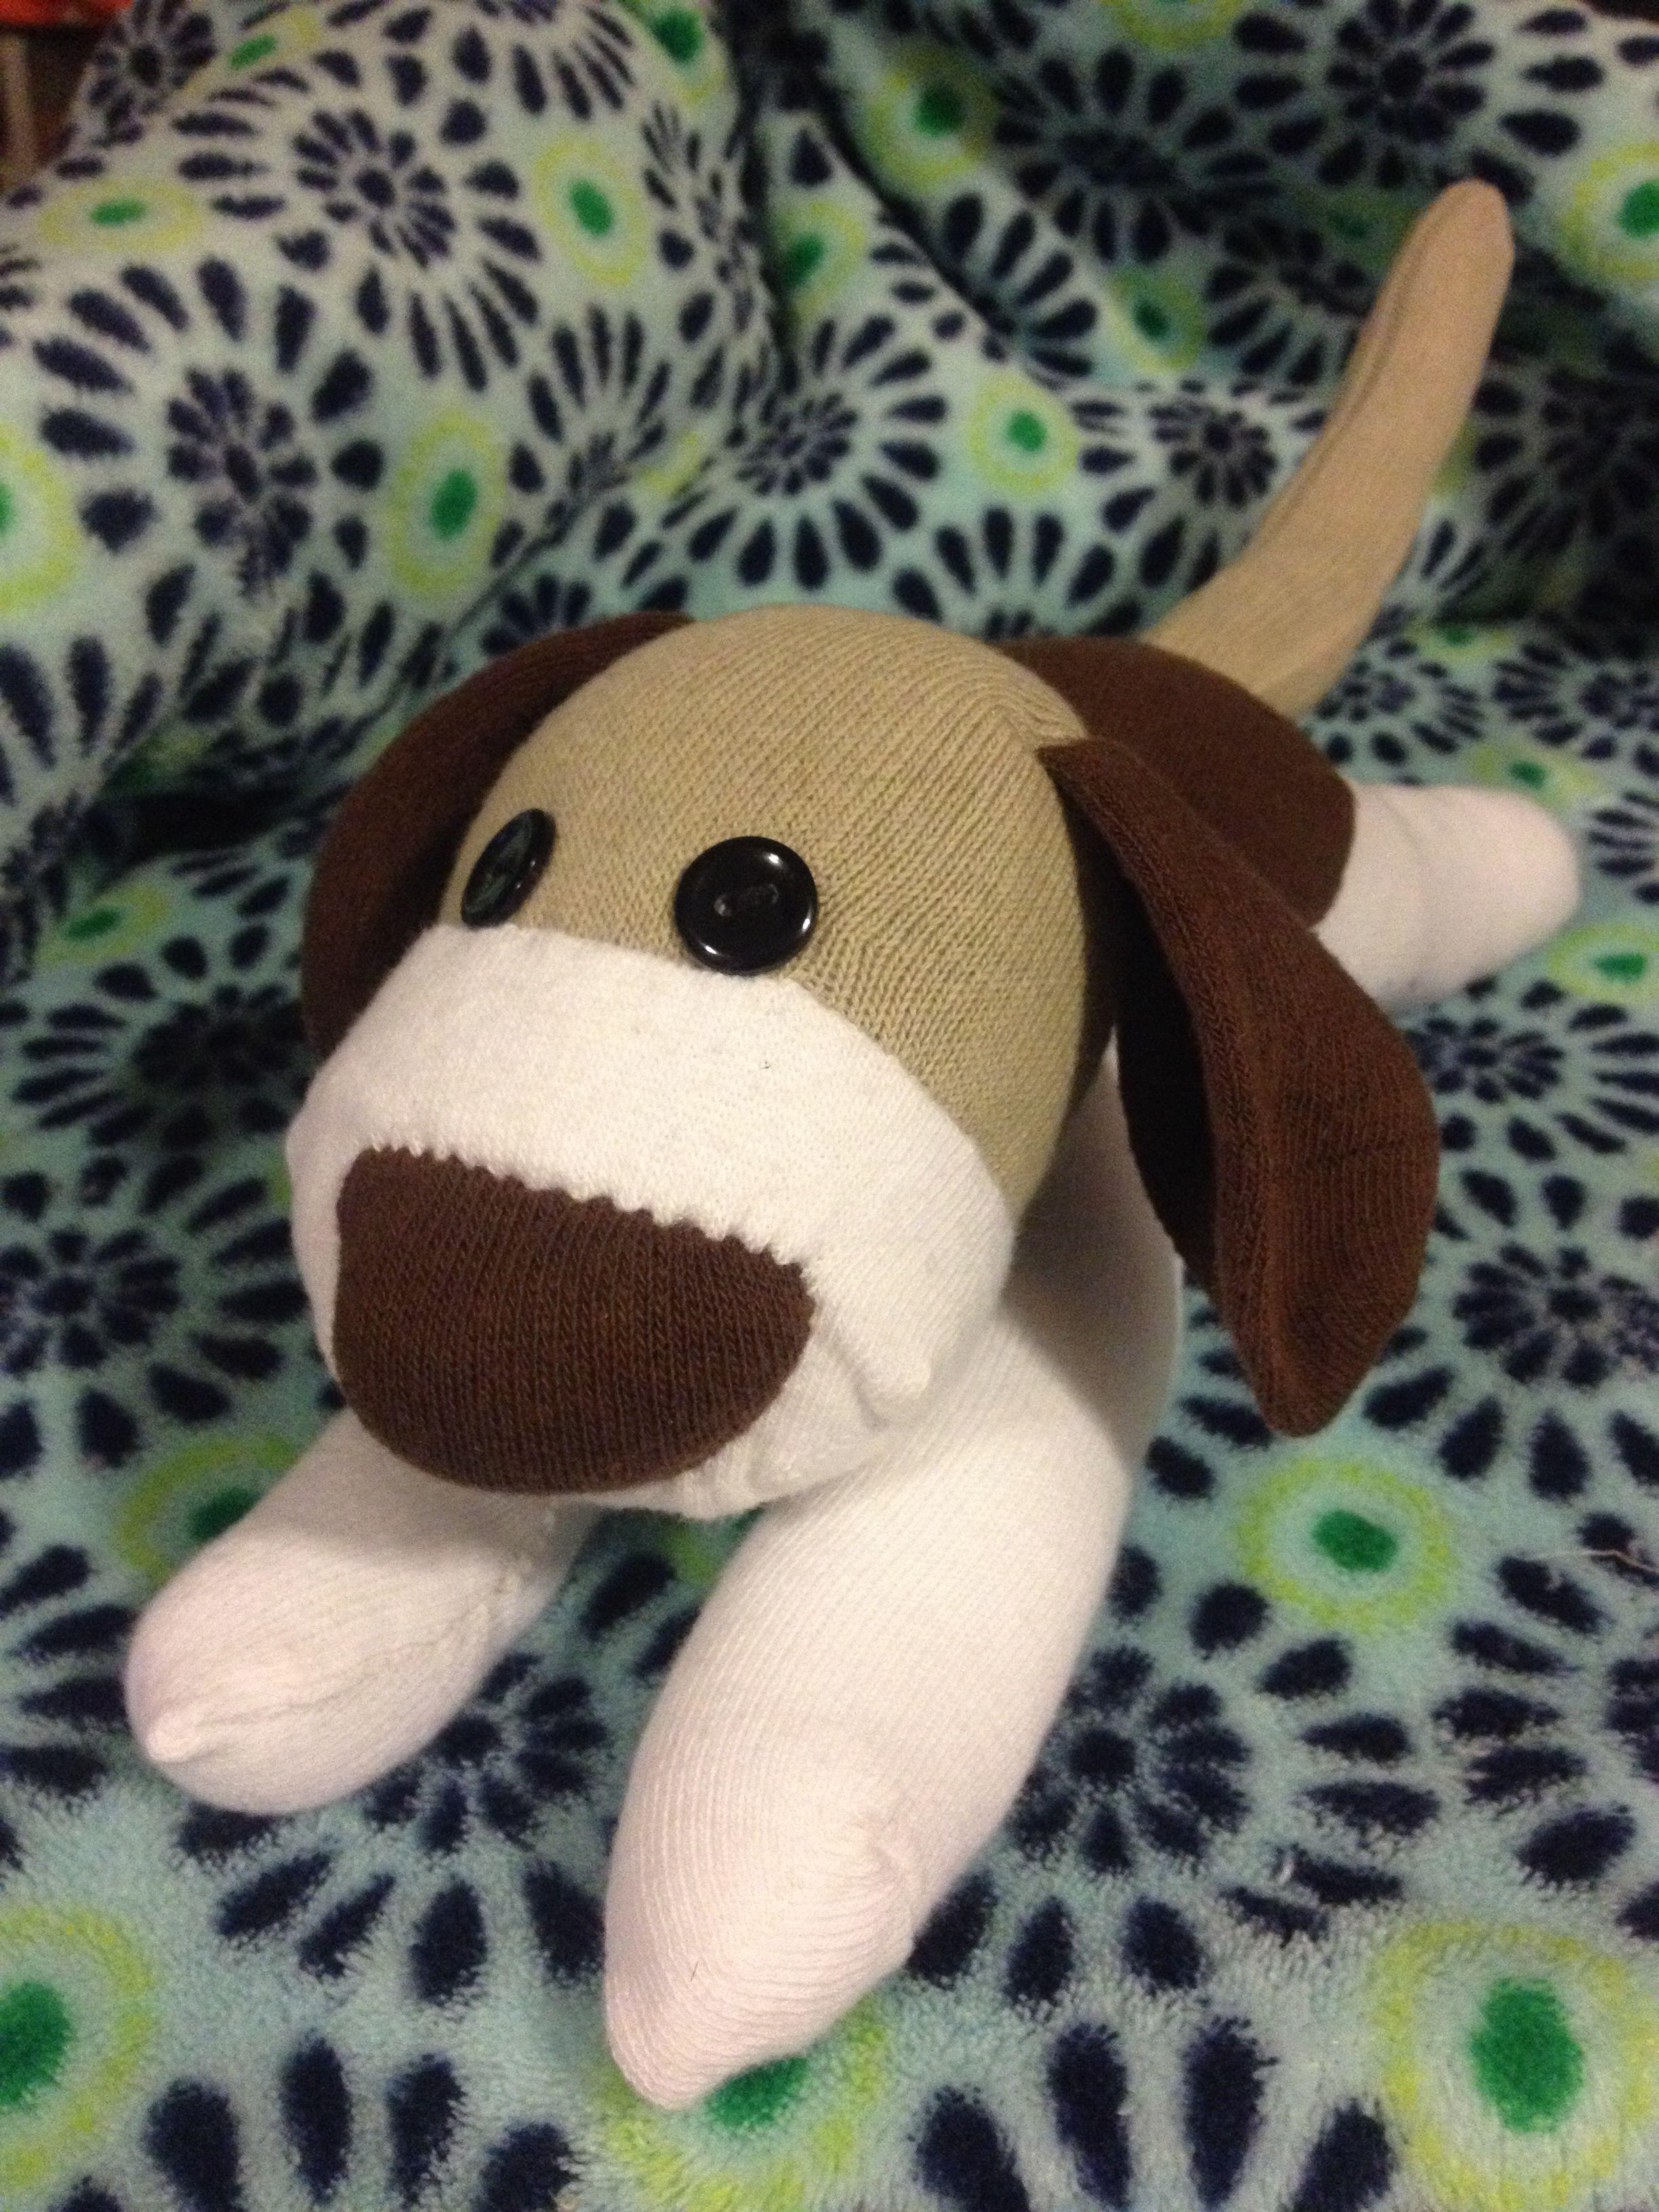 Sock Dog Sock Beagle Plush Beagle Sock Monkey Order Custom Sock Animals At Www Facebook Com Mbinak Sock Animals Sock Toys Plush Beagle [ 3264 x 2448 Pixel ]